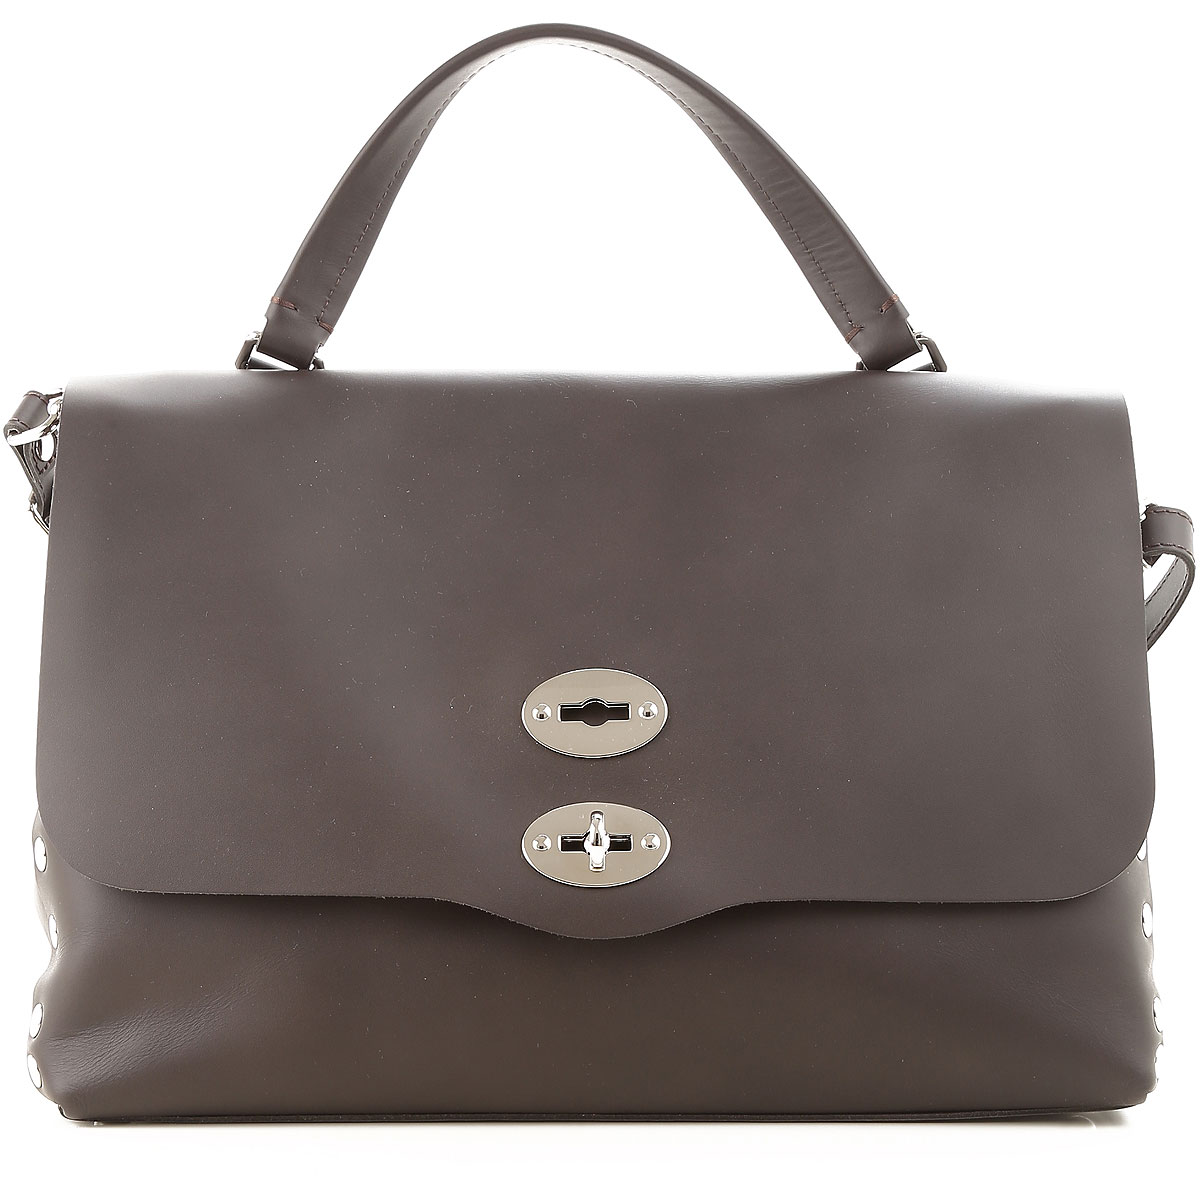 Image of Zanellato Handbags, Postina M, Ardesia Grey, Leather, 2017